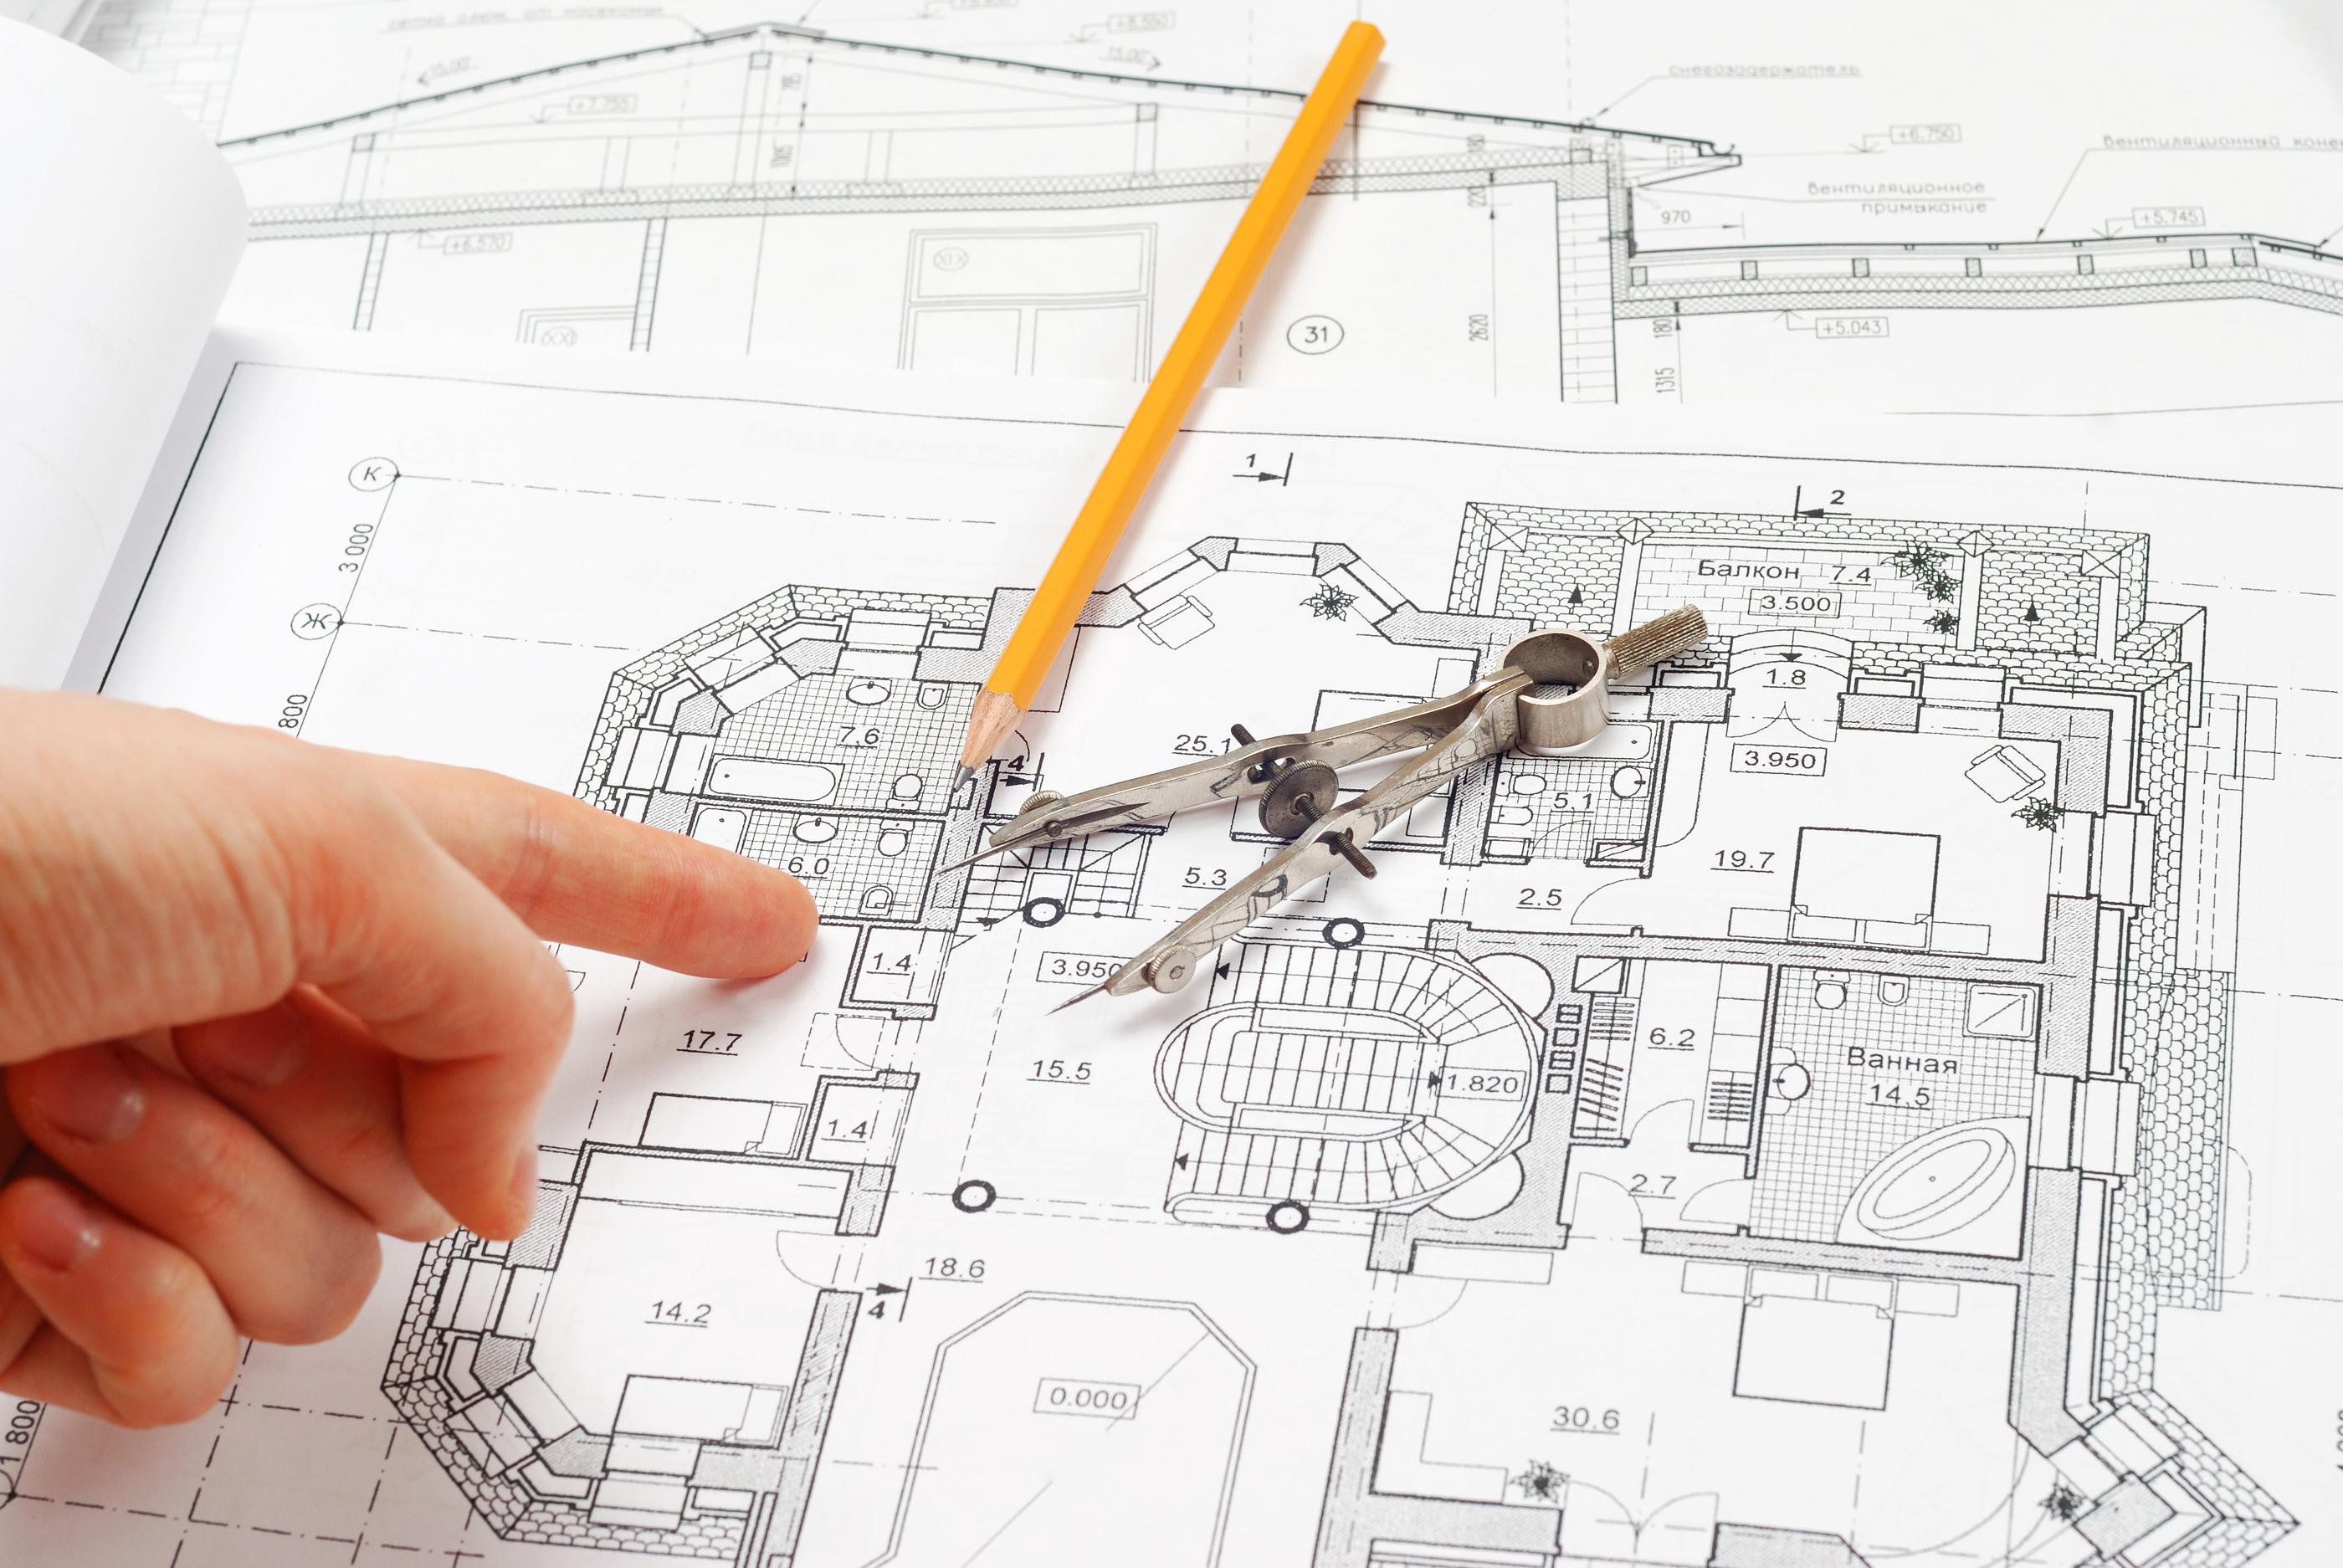 House plan blueprints, designer's hand